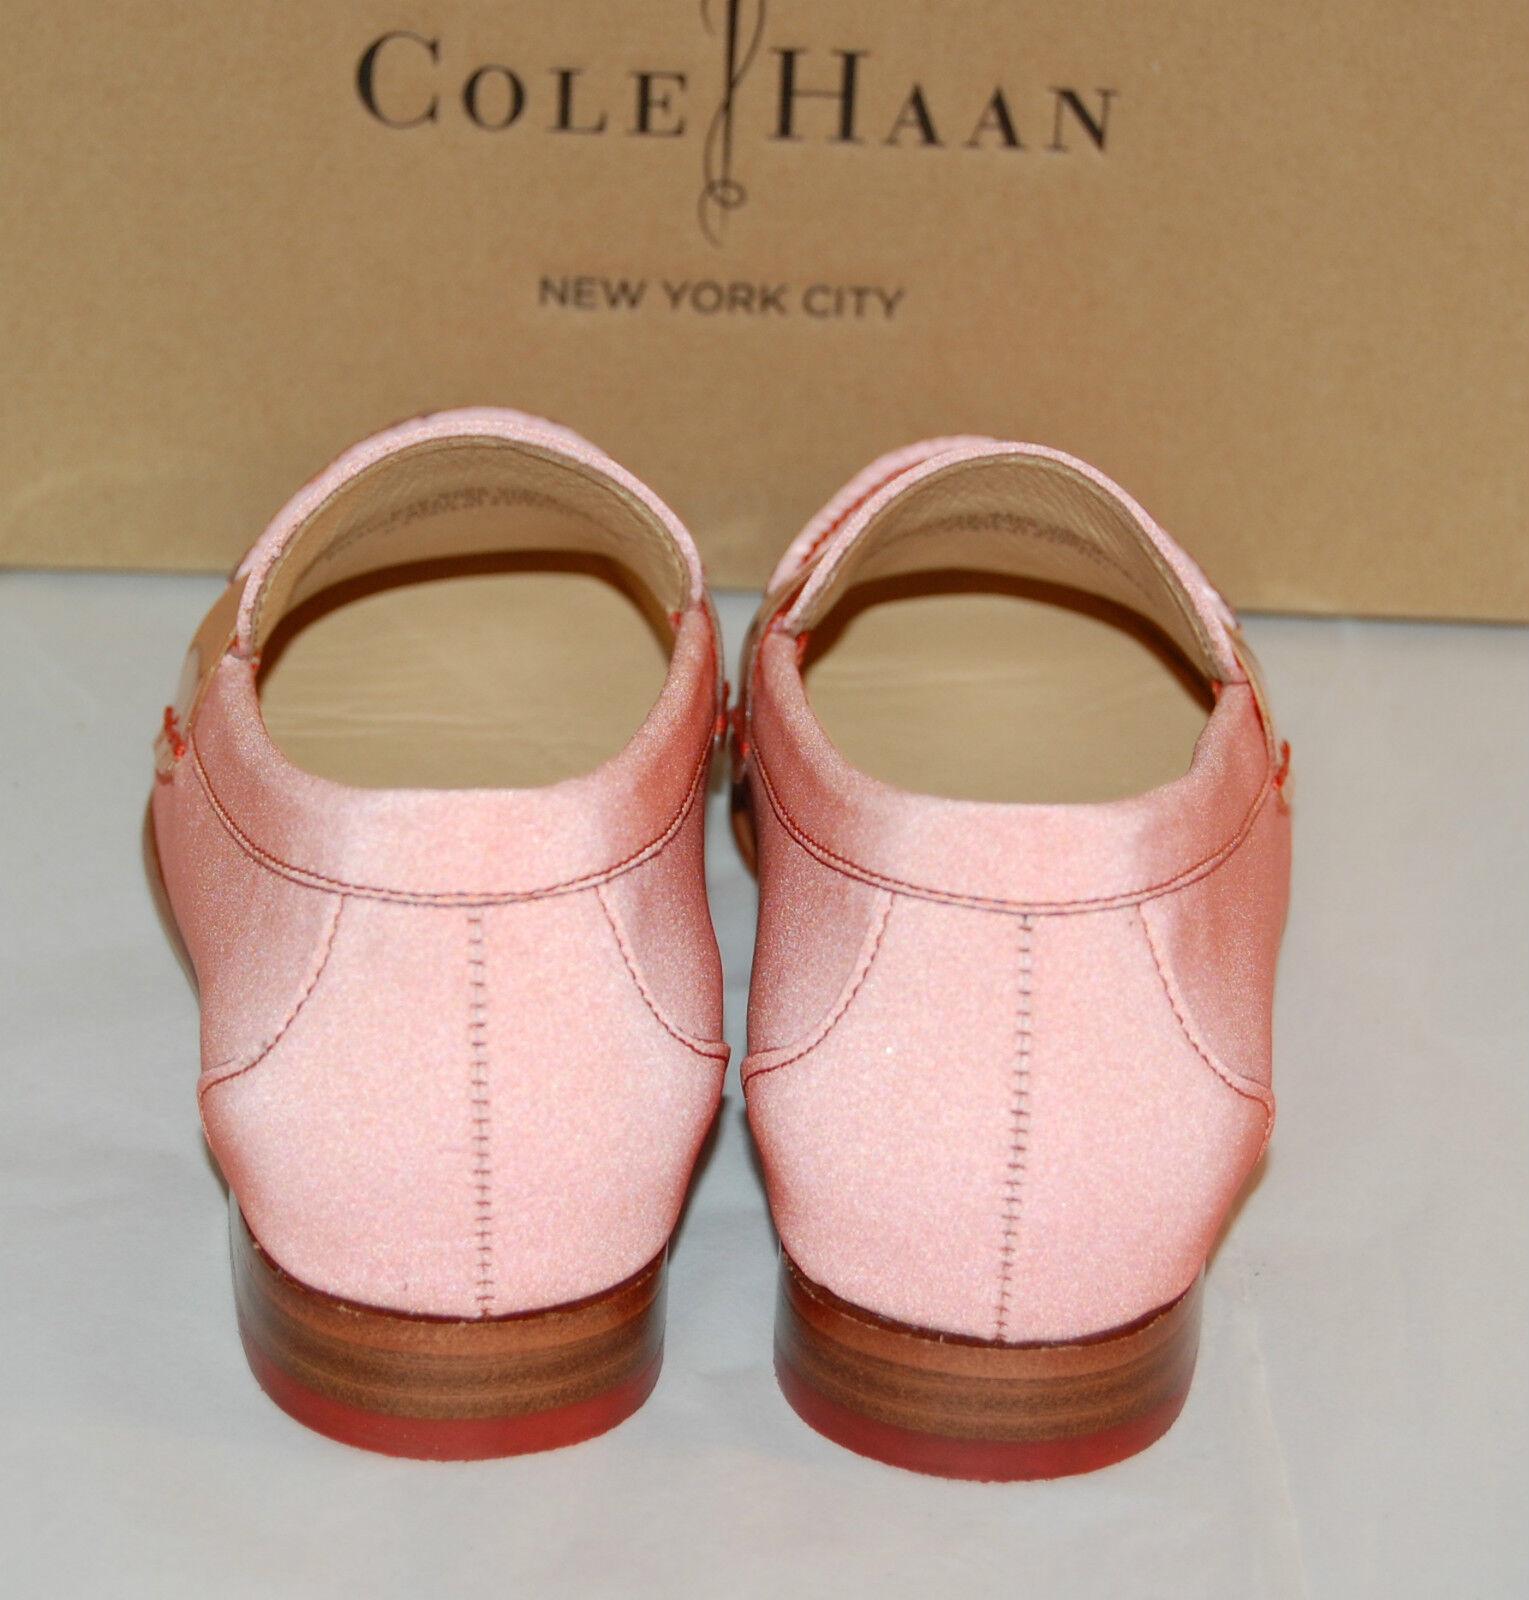 New  198 Cole Haan Haan Haan REFLECTIVE Nike Air Monroe Penny orange Pop Loafer lot 0b2307